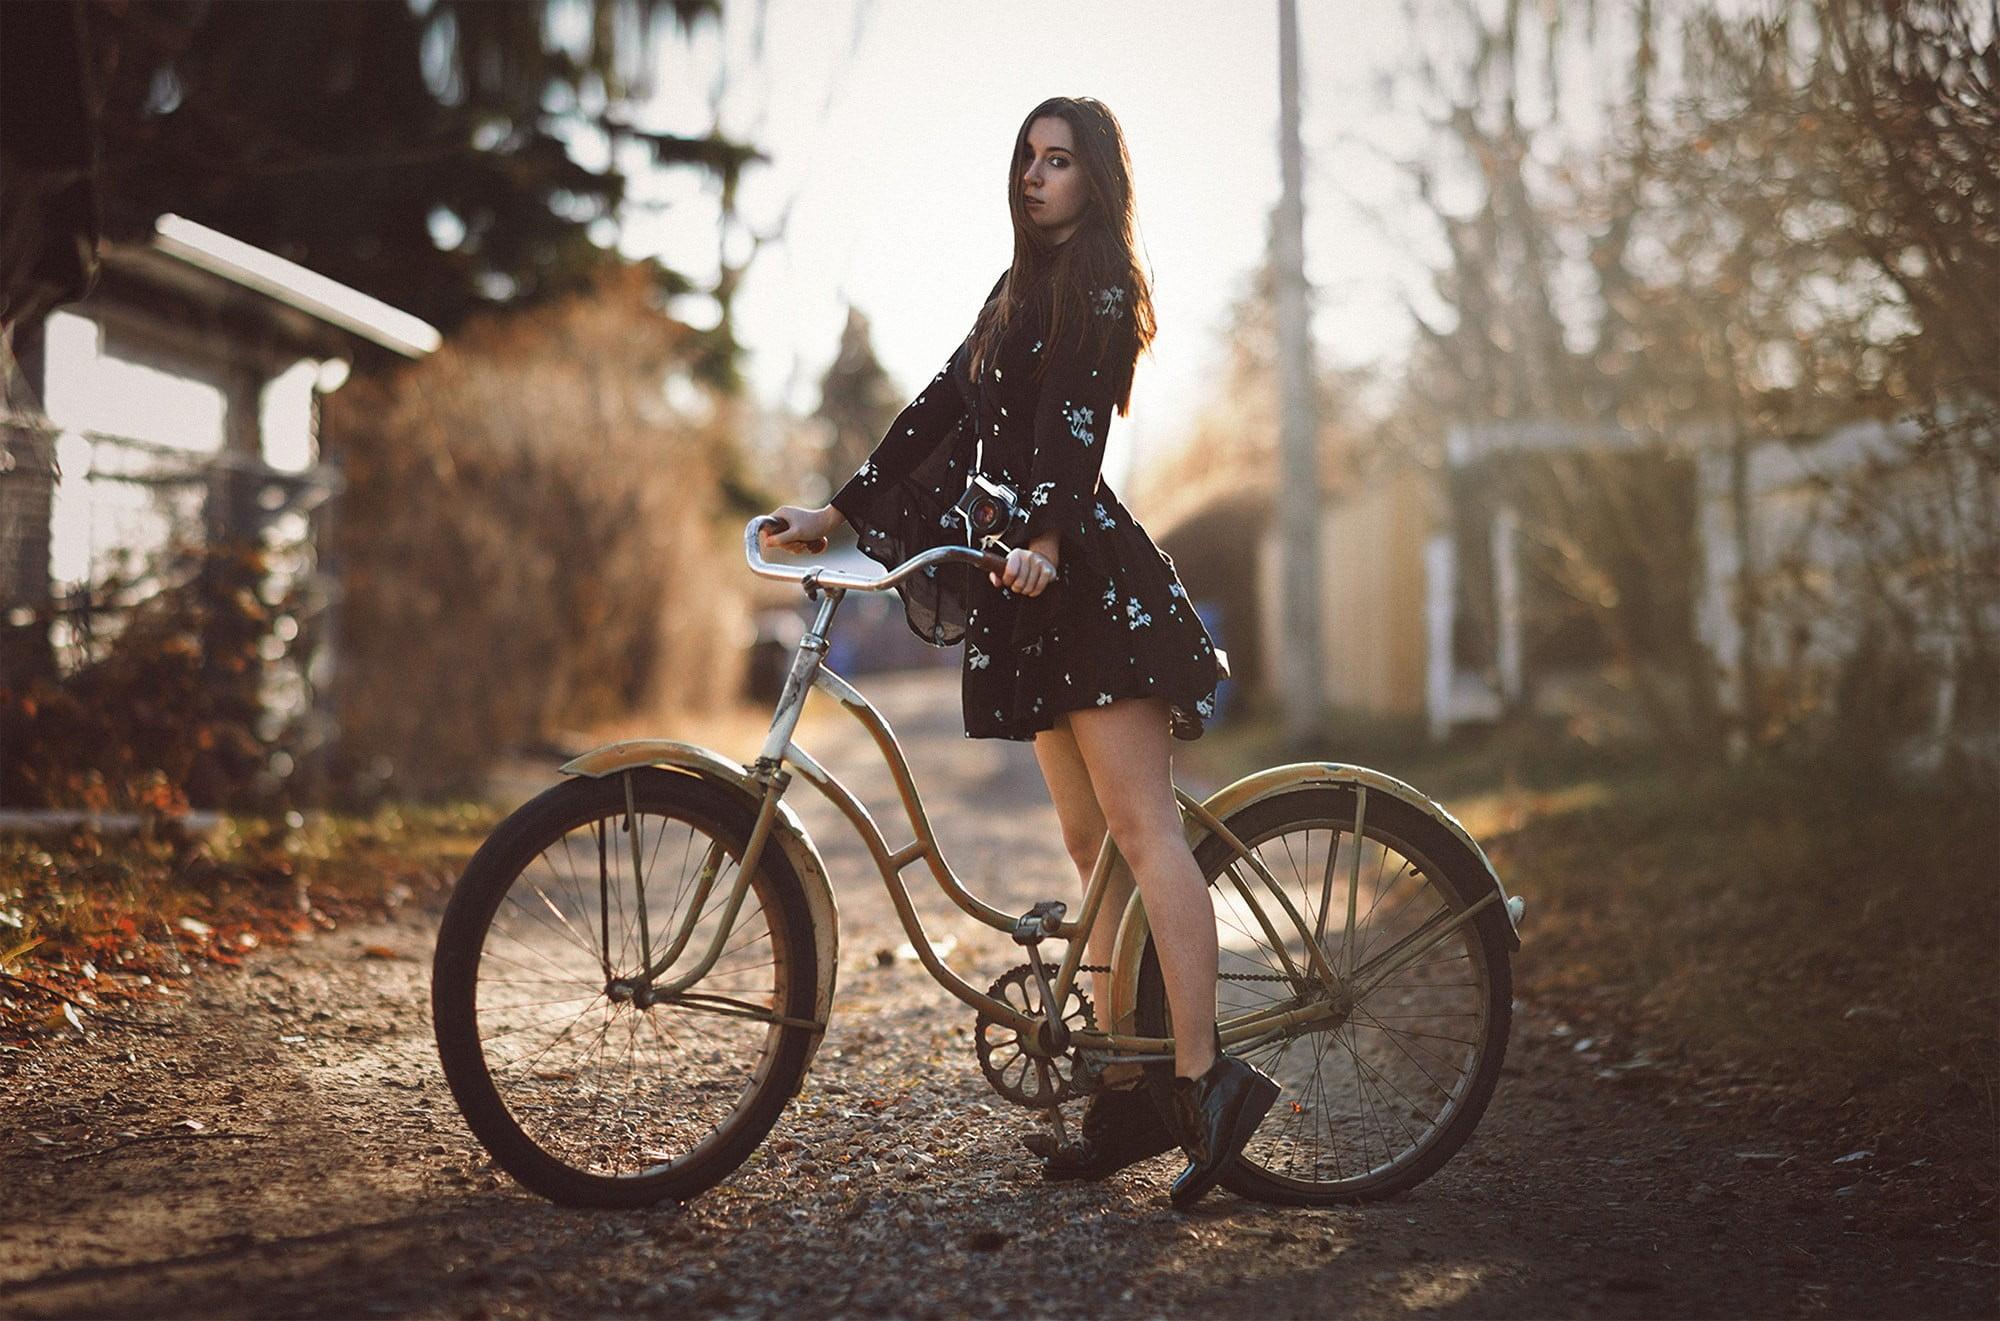 Woman riding on brown beach cruiser bike standing on brown road ...